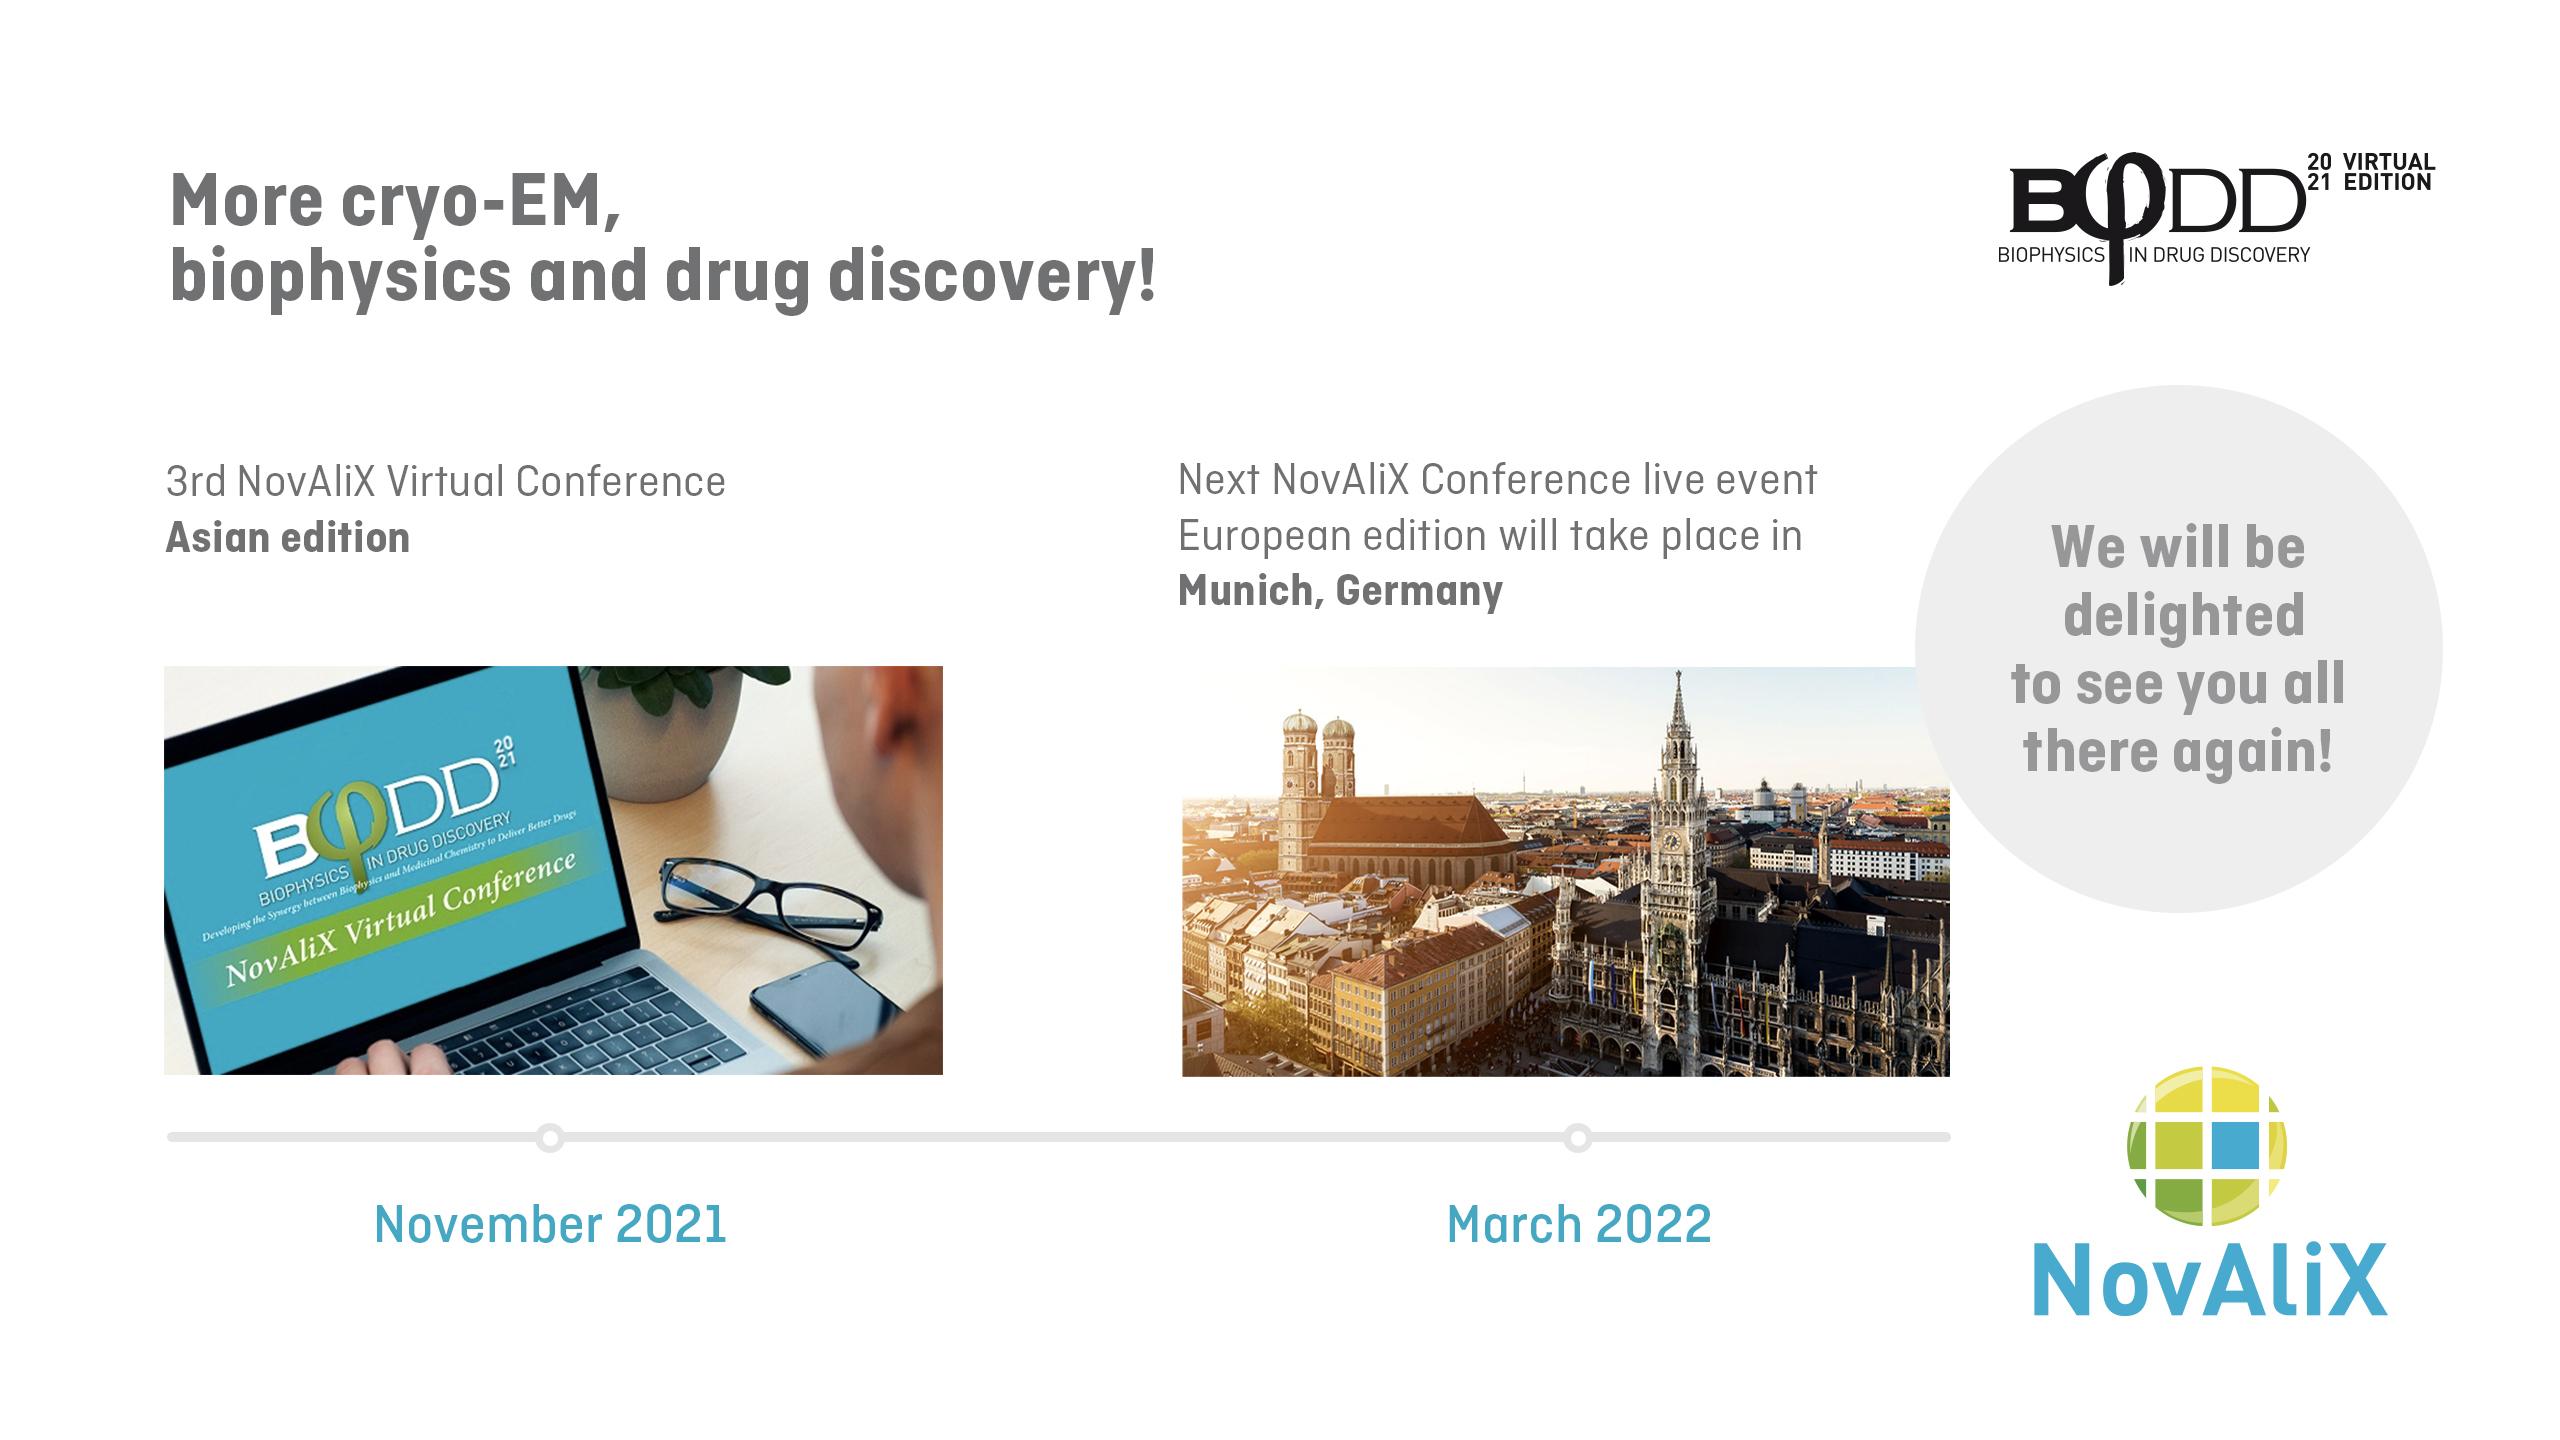 NovAliX Virtual Conference